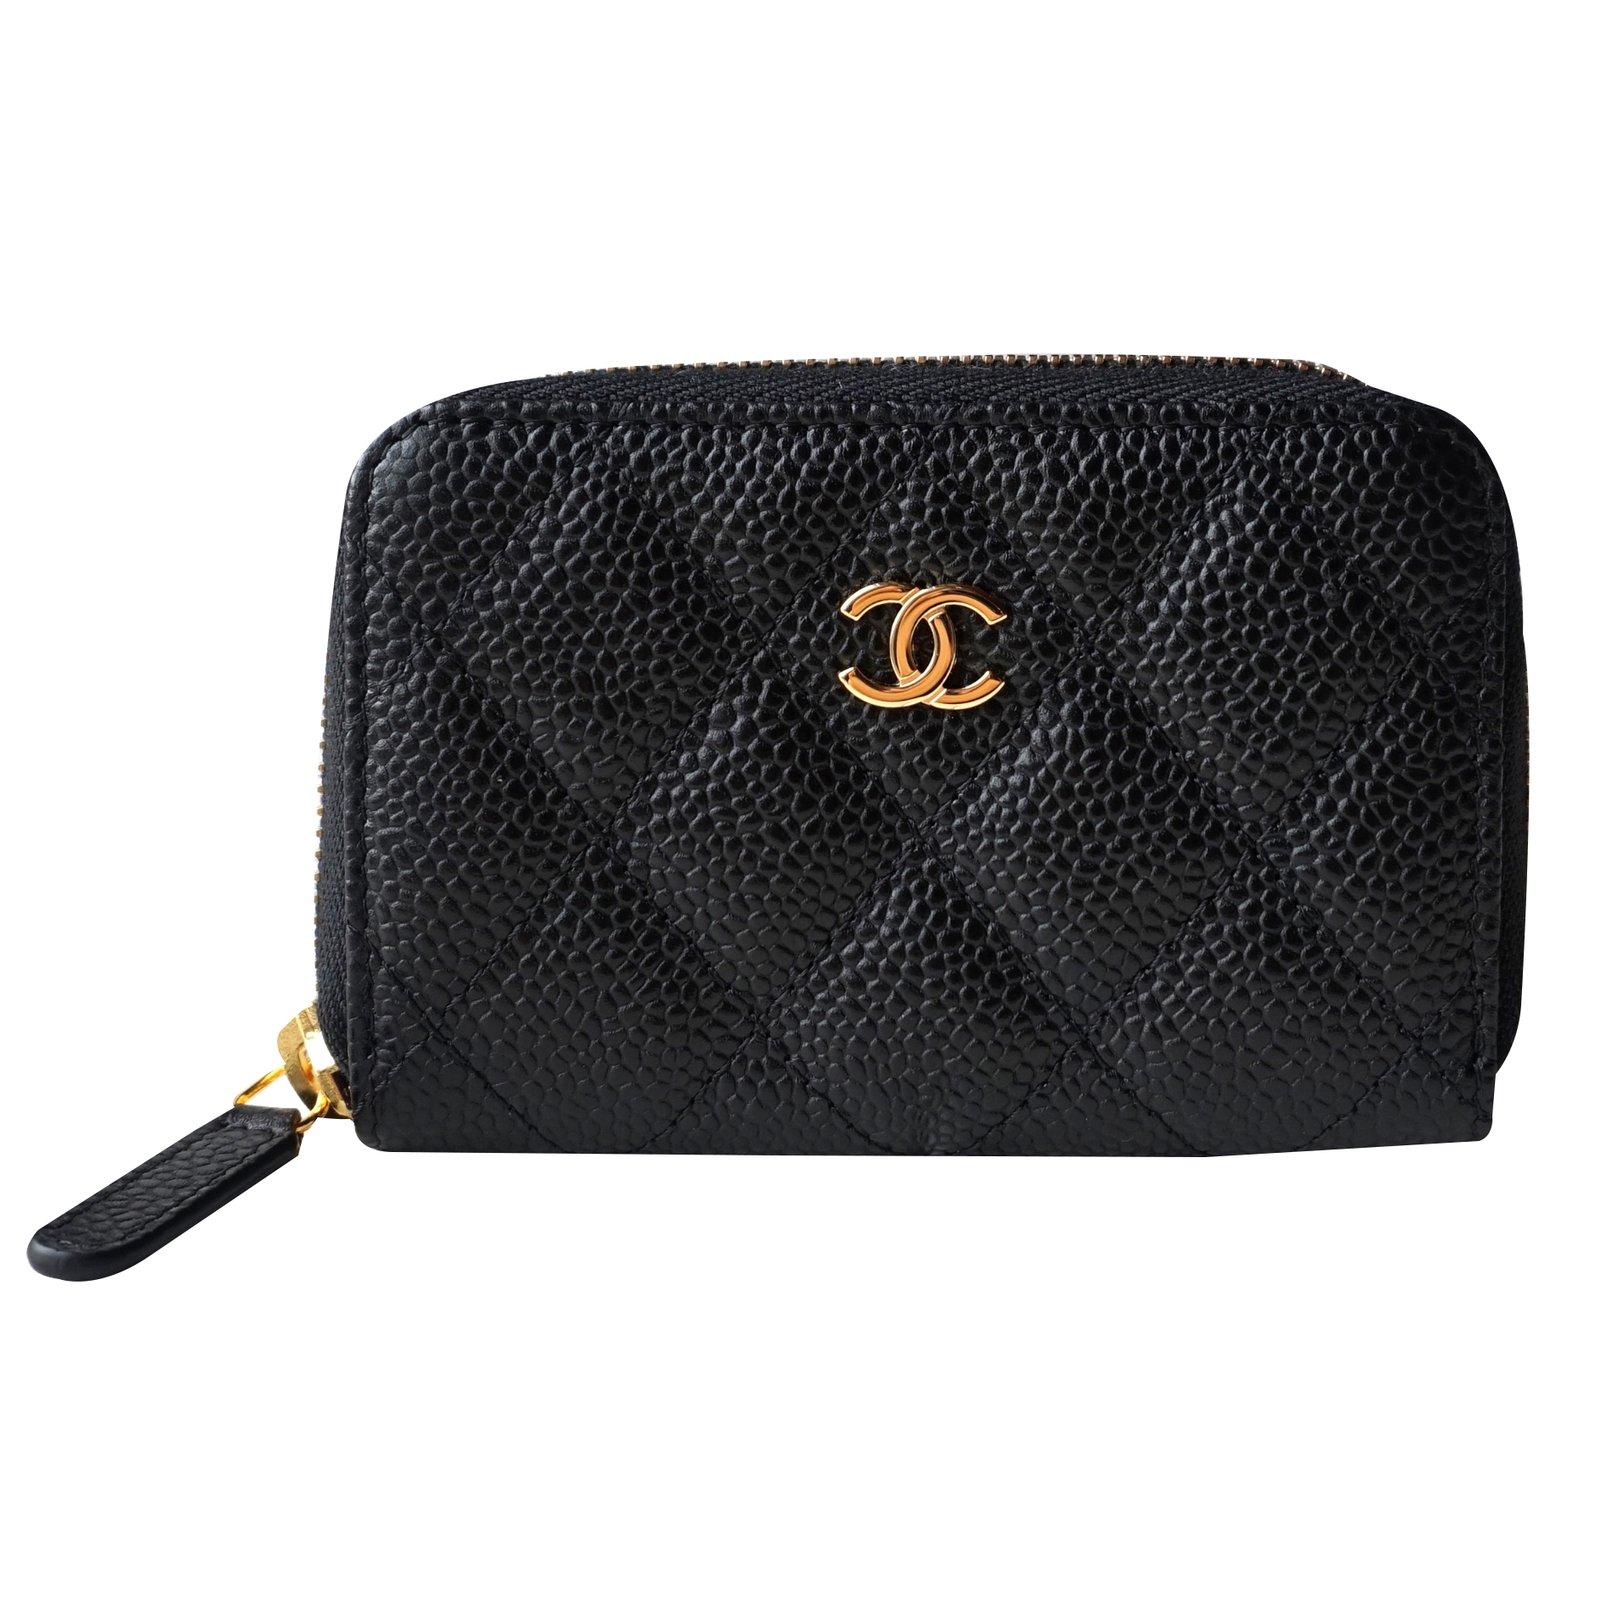 f05639c6e51c Chanel Card Holder Wallet Wallets Leather Black Ref 21971 Joli Closet